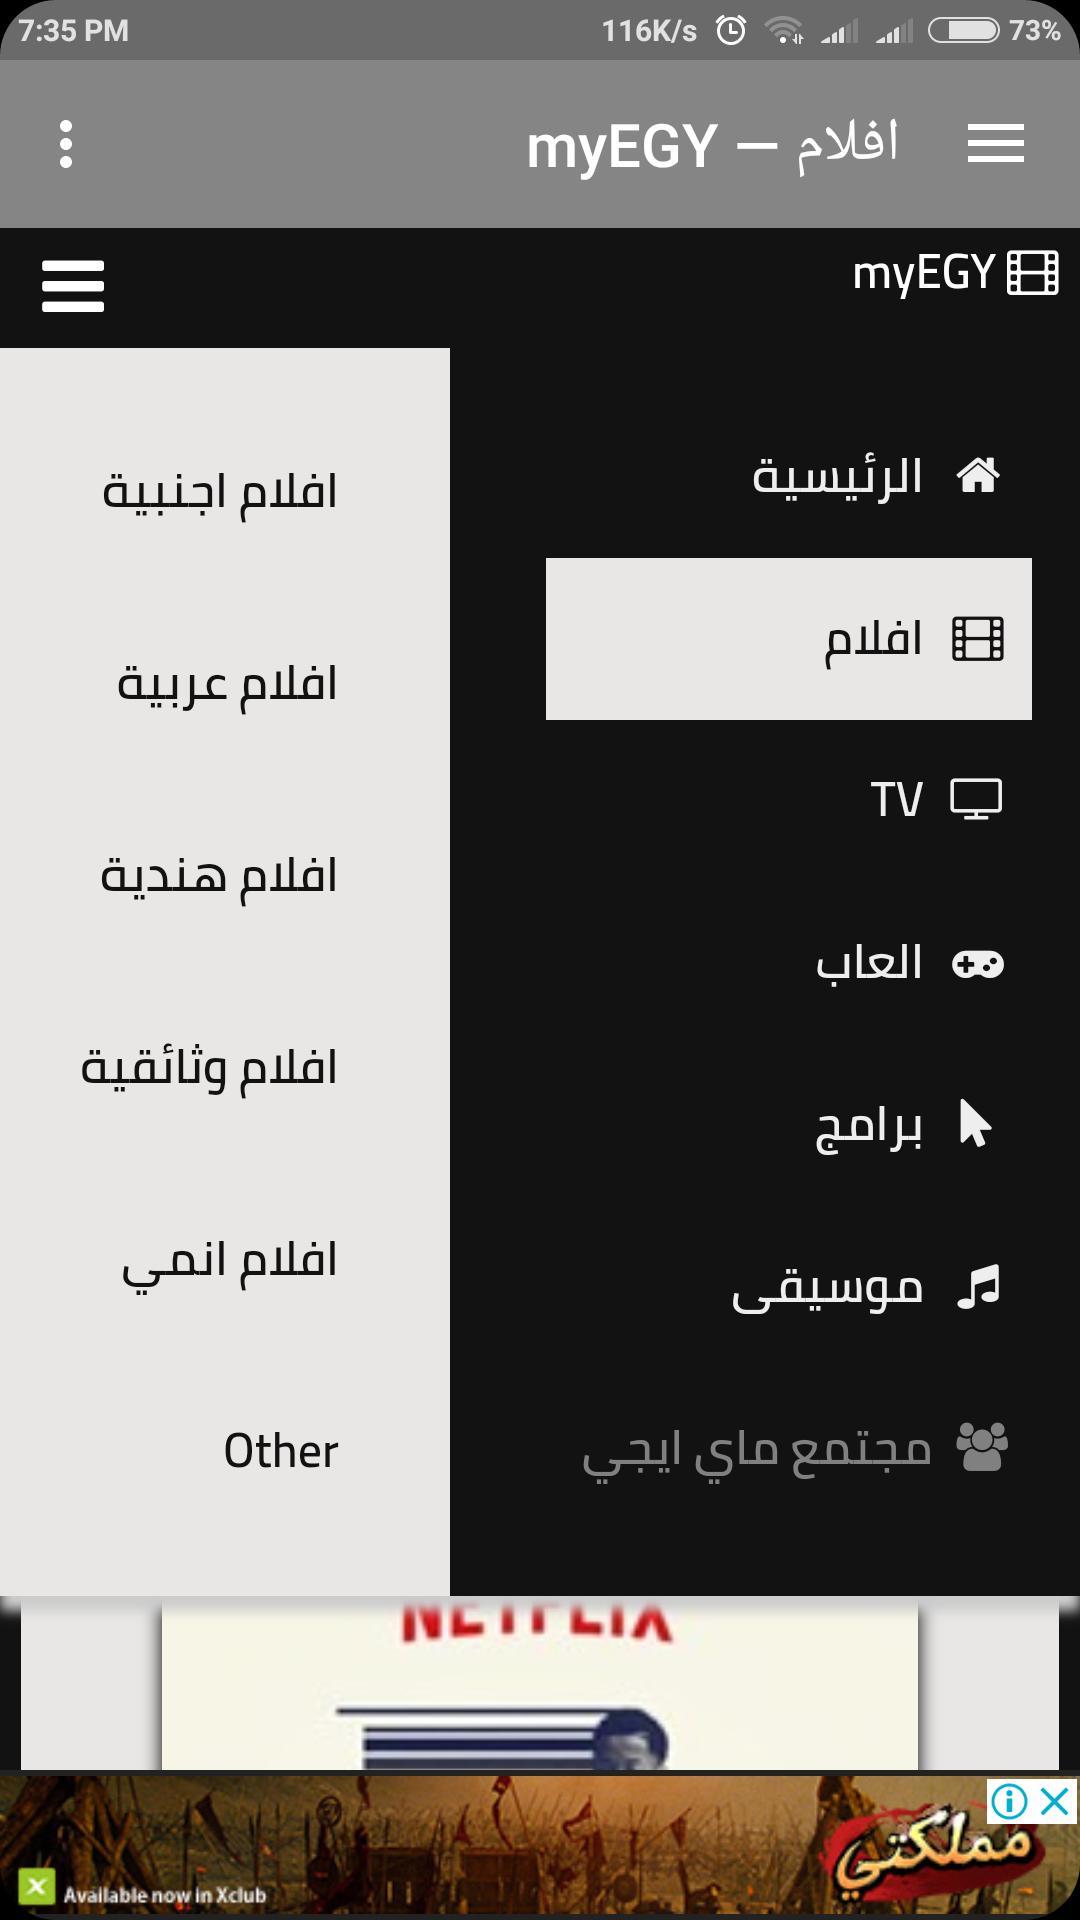 myegy para Android - APK Baixar